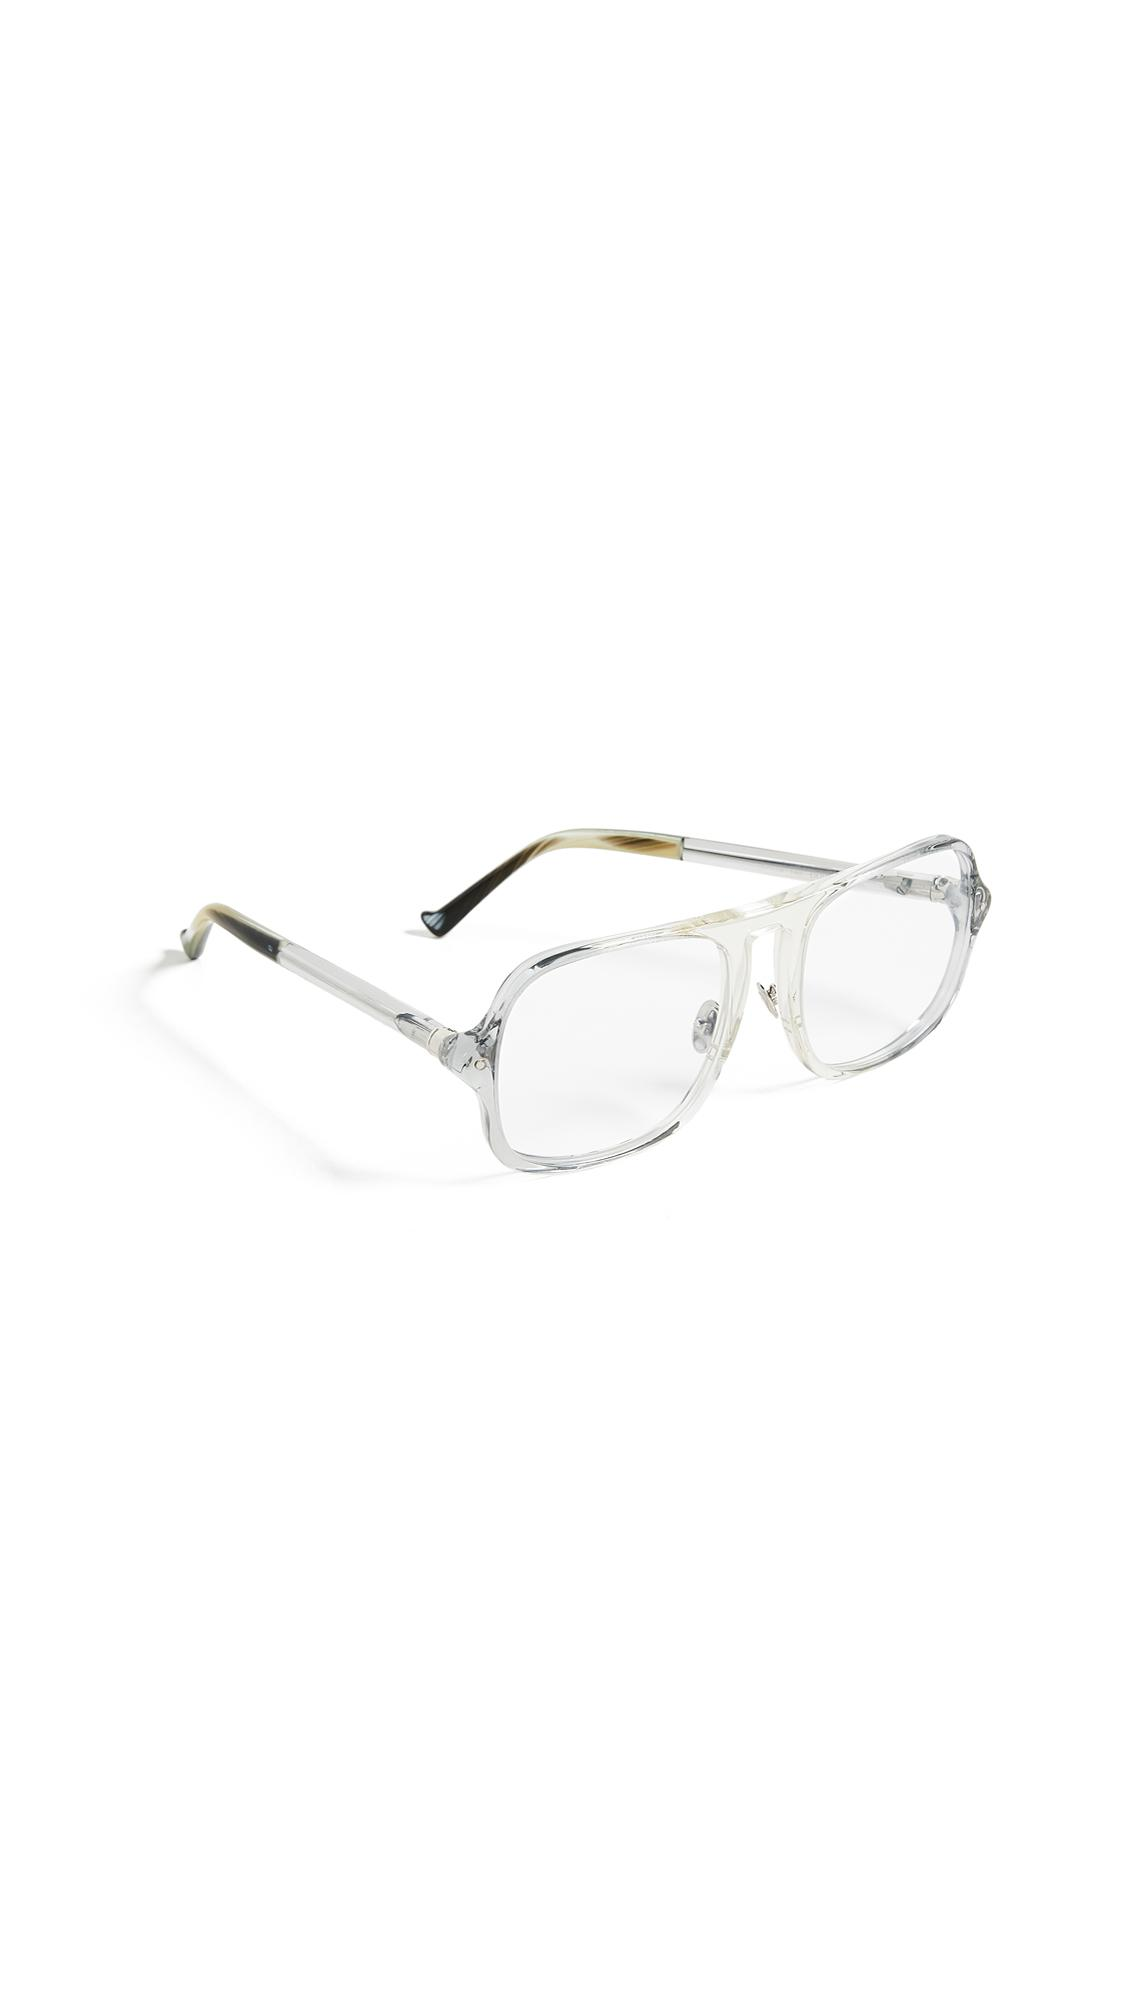 5a5e56229b Lyst - Grey Ant Coum Glasses